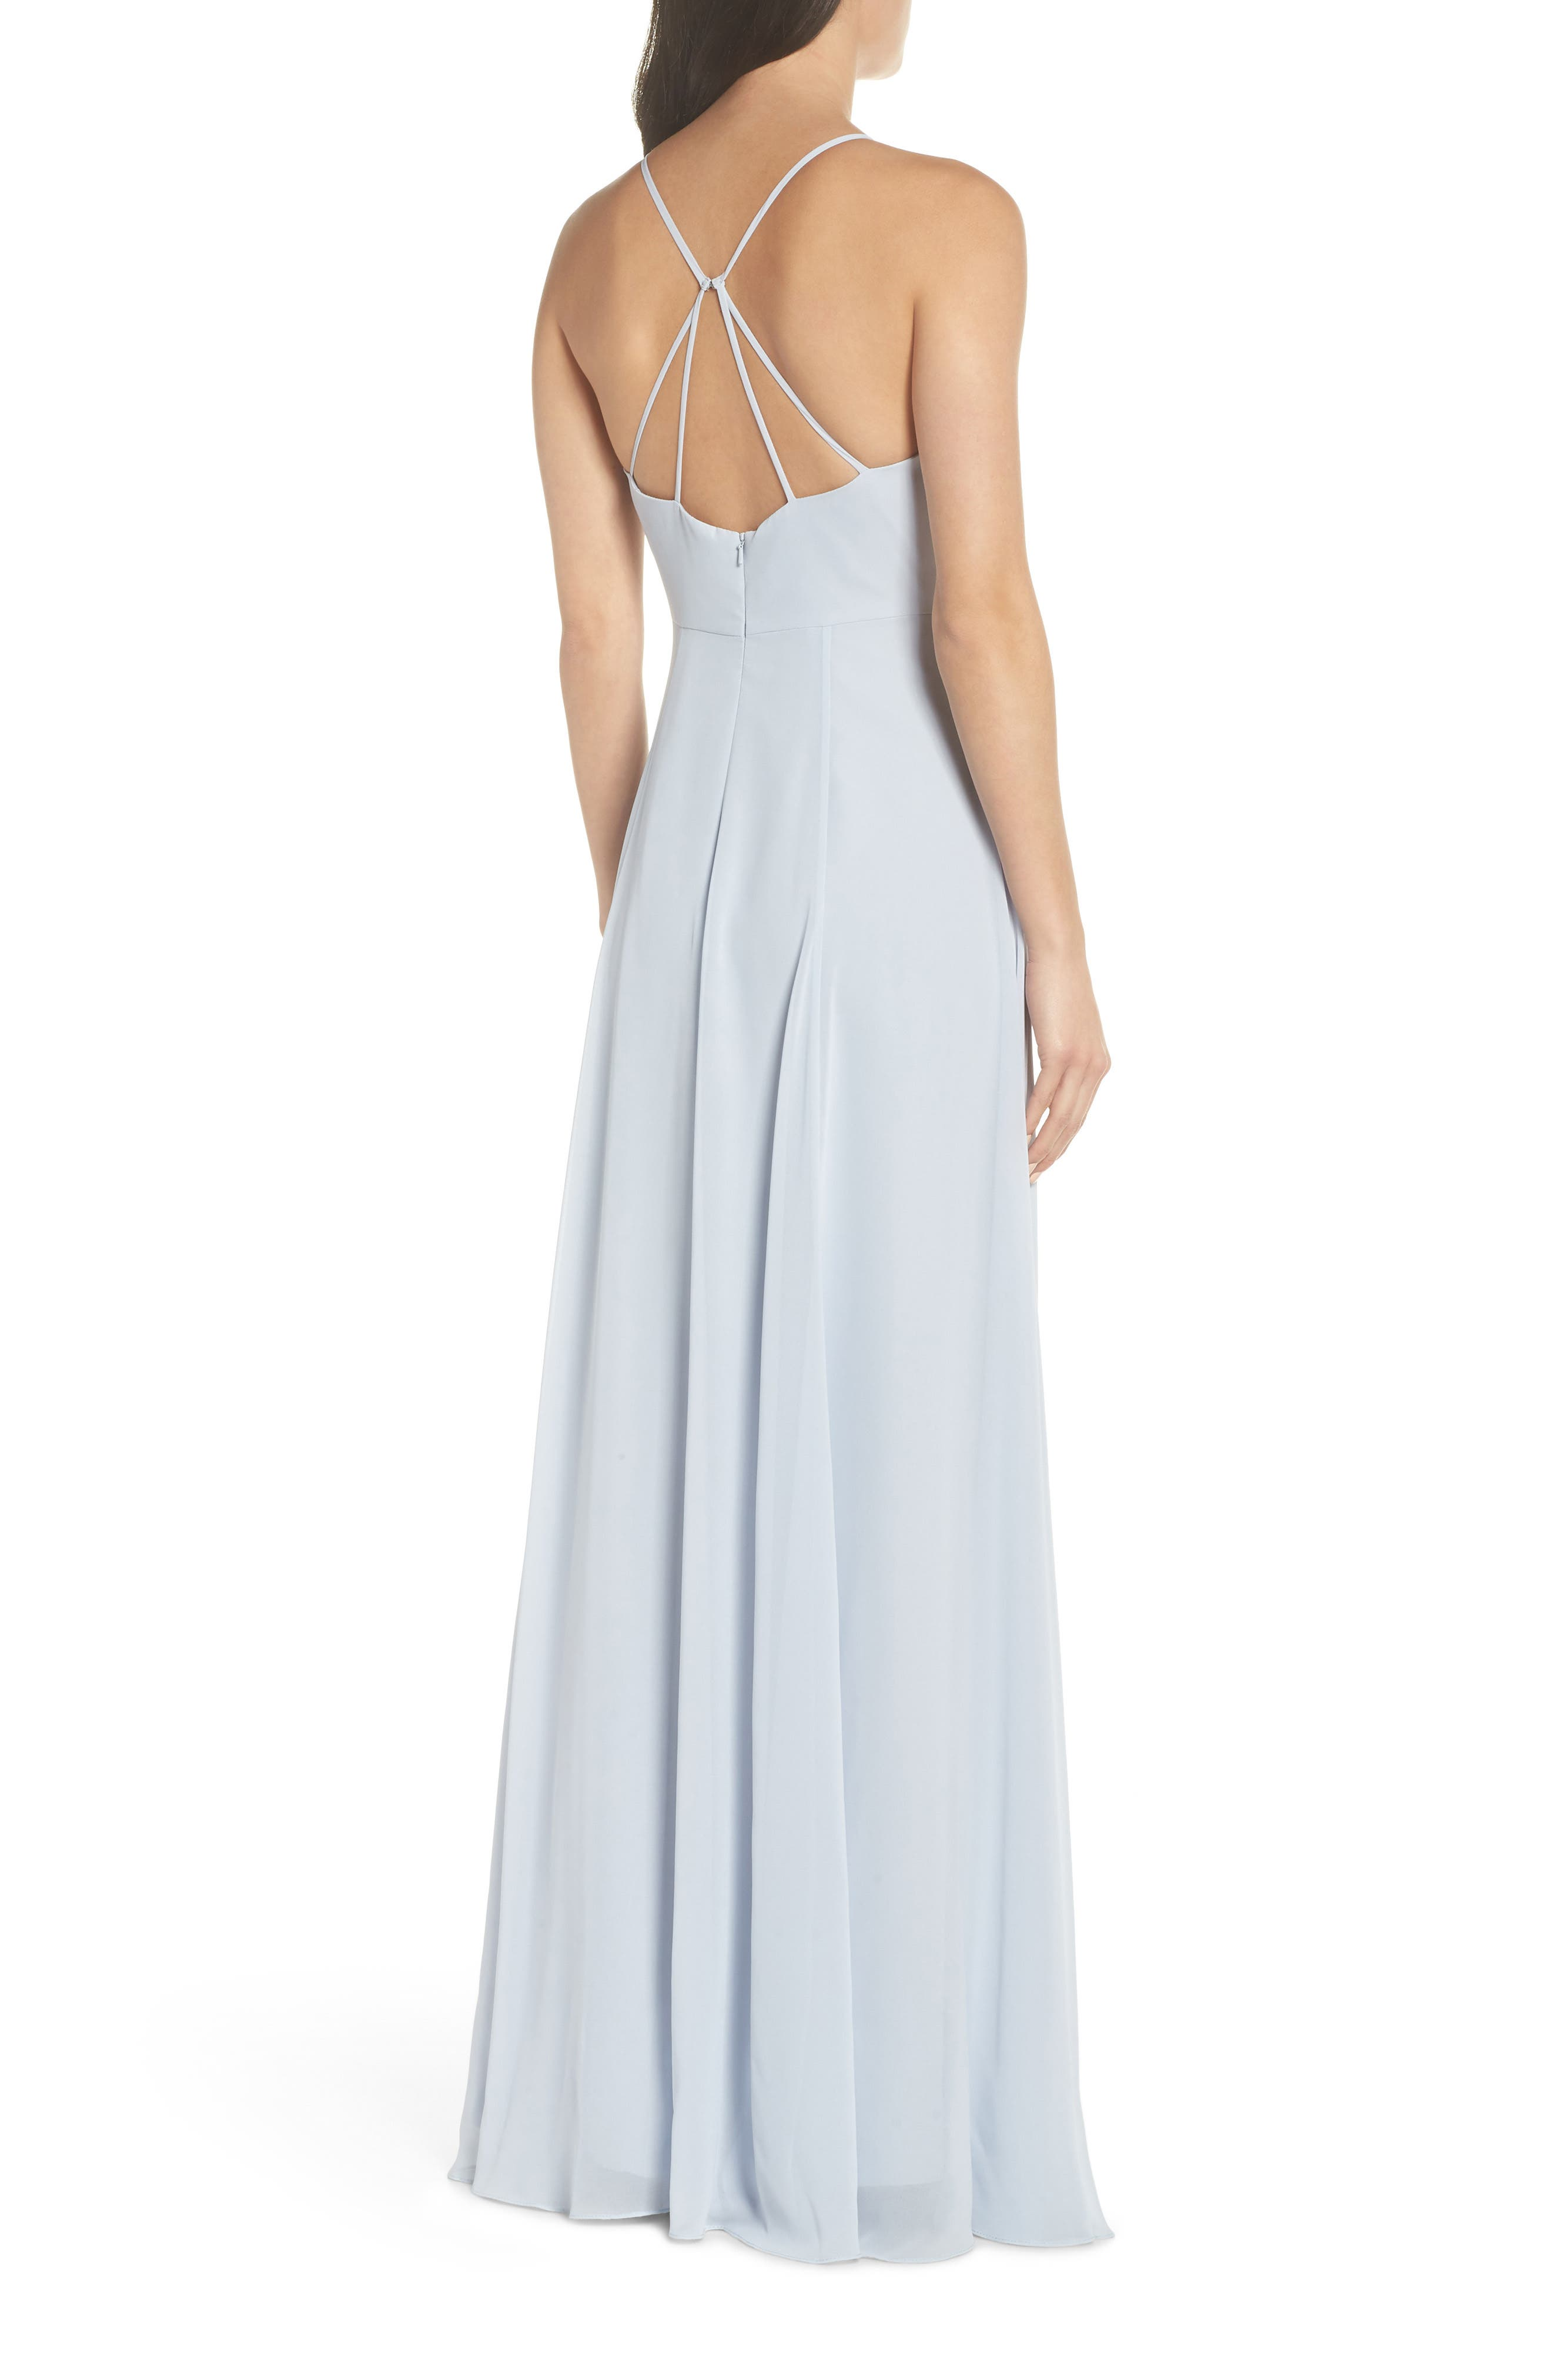 JENNY YOO, Kayla A-Line Halter Gown, Alternate thumbnail 2, color, WHISPER BLUE